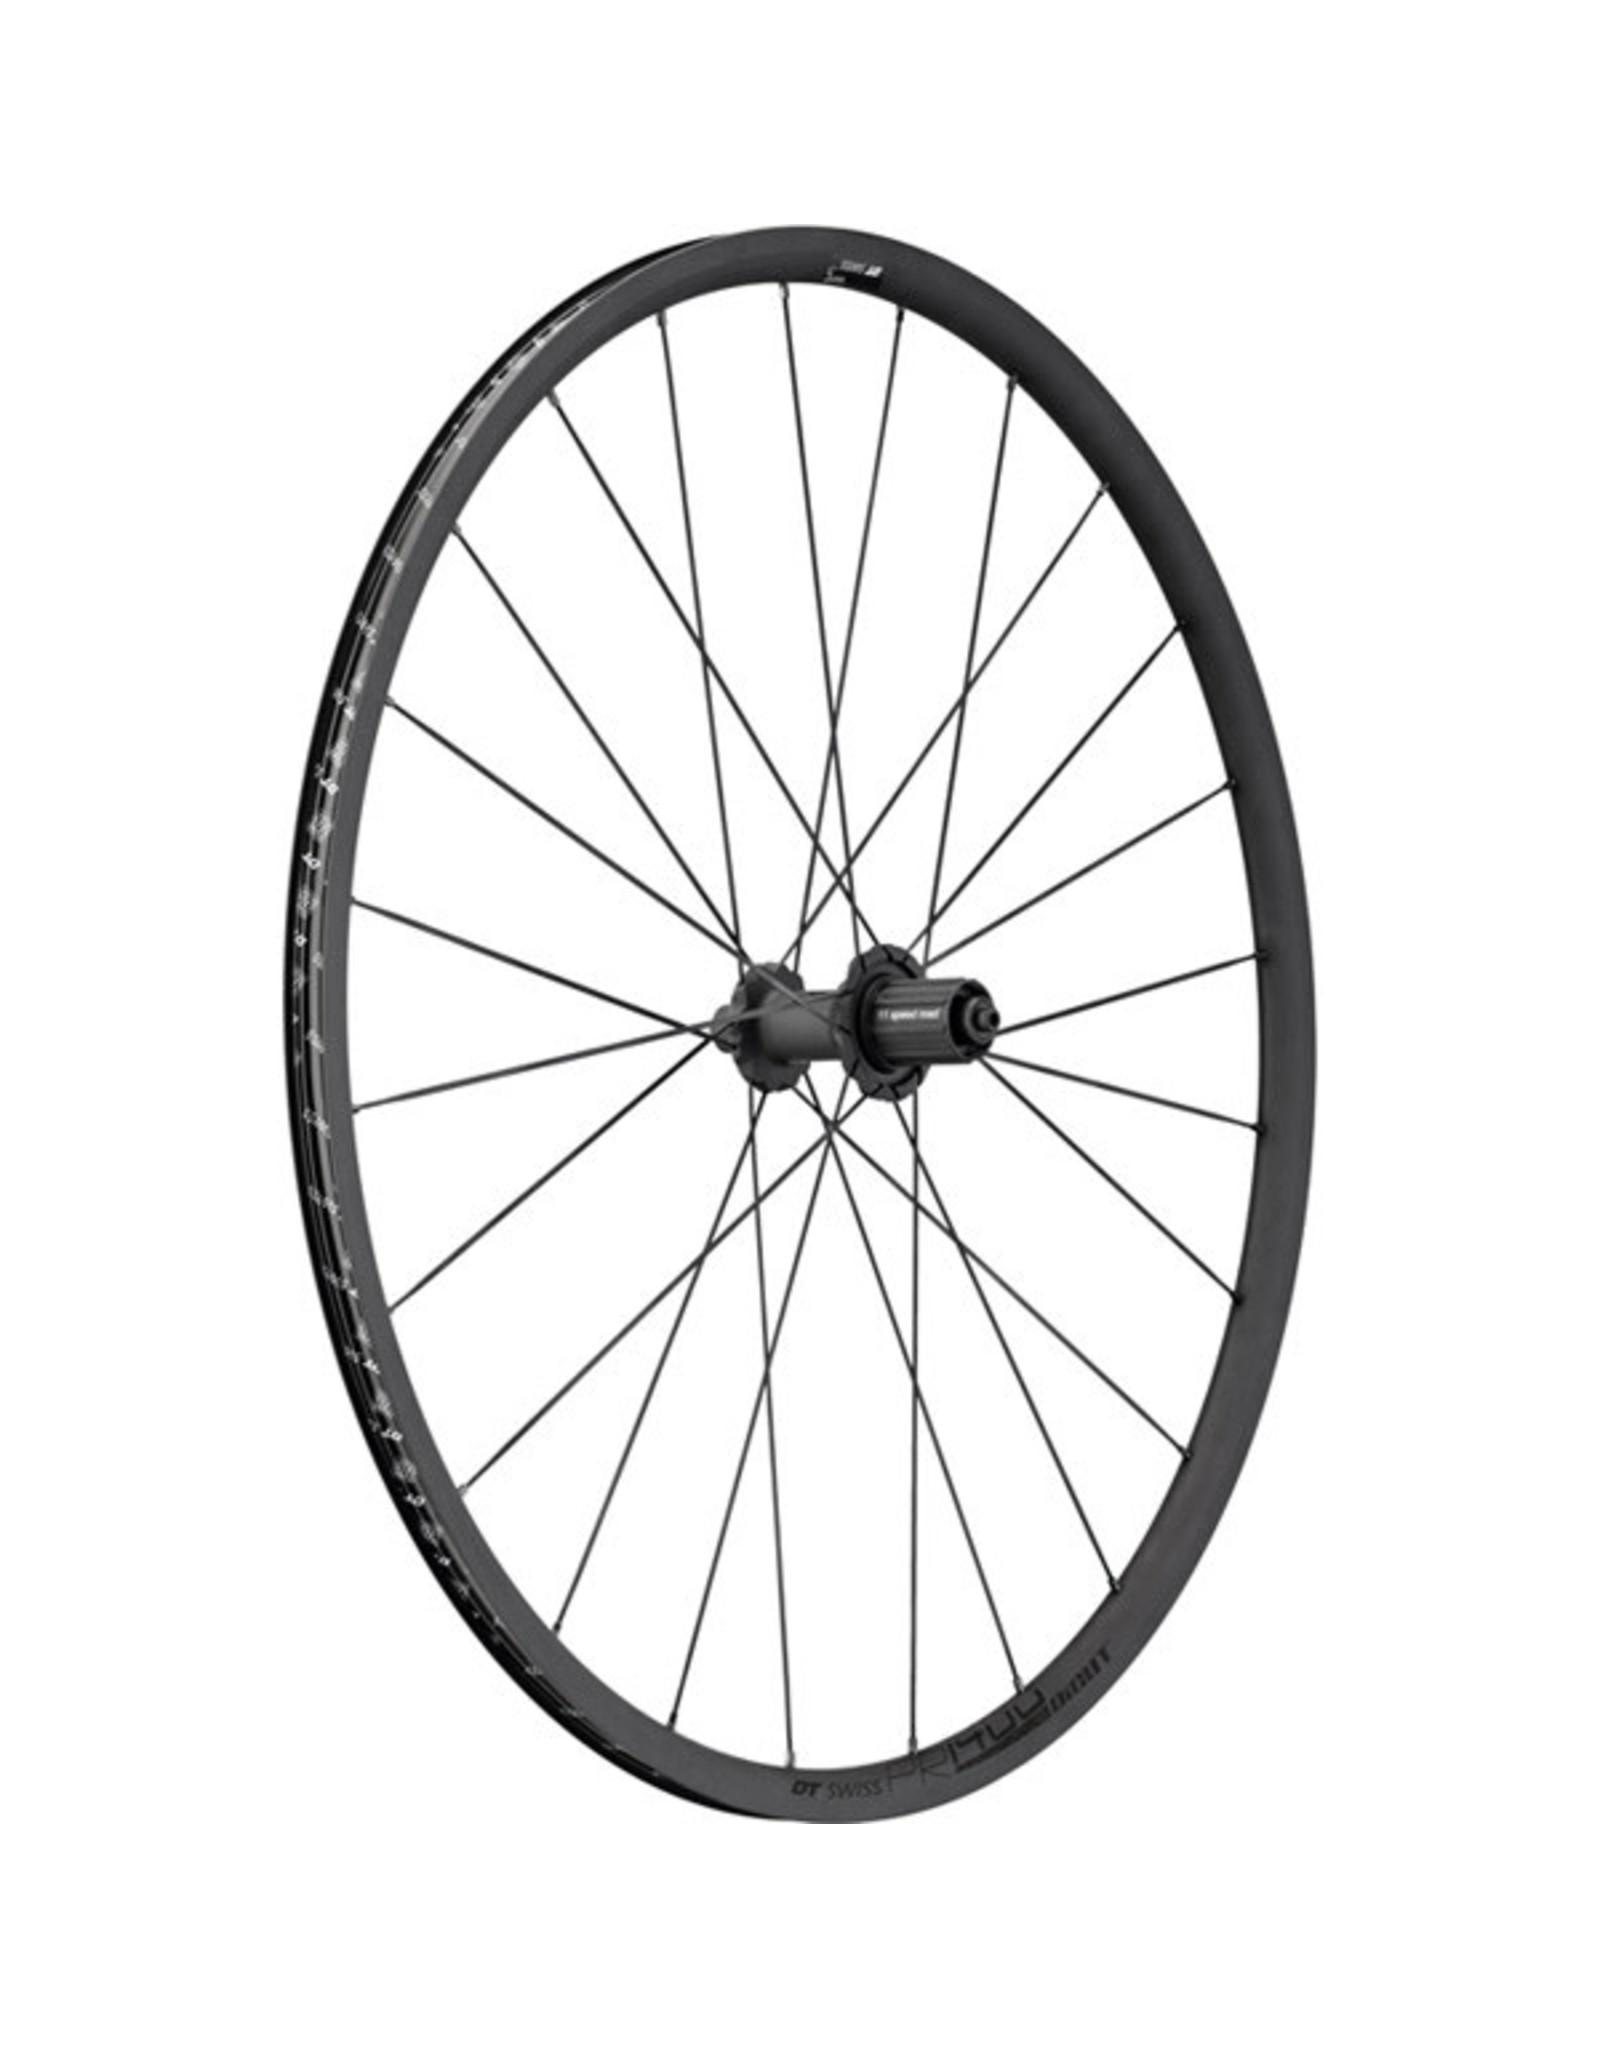 DT Swiss Wheel PR 1400